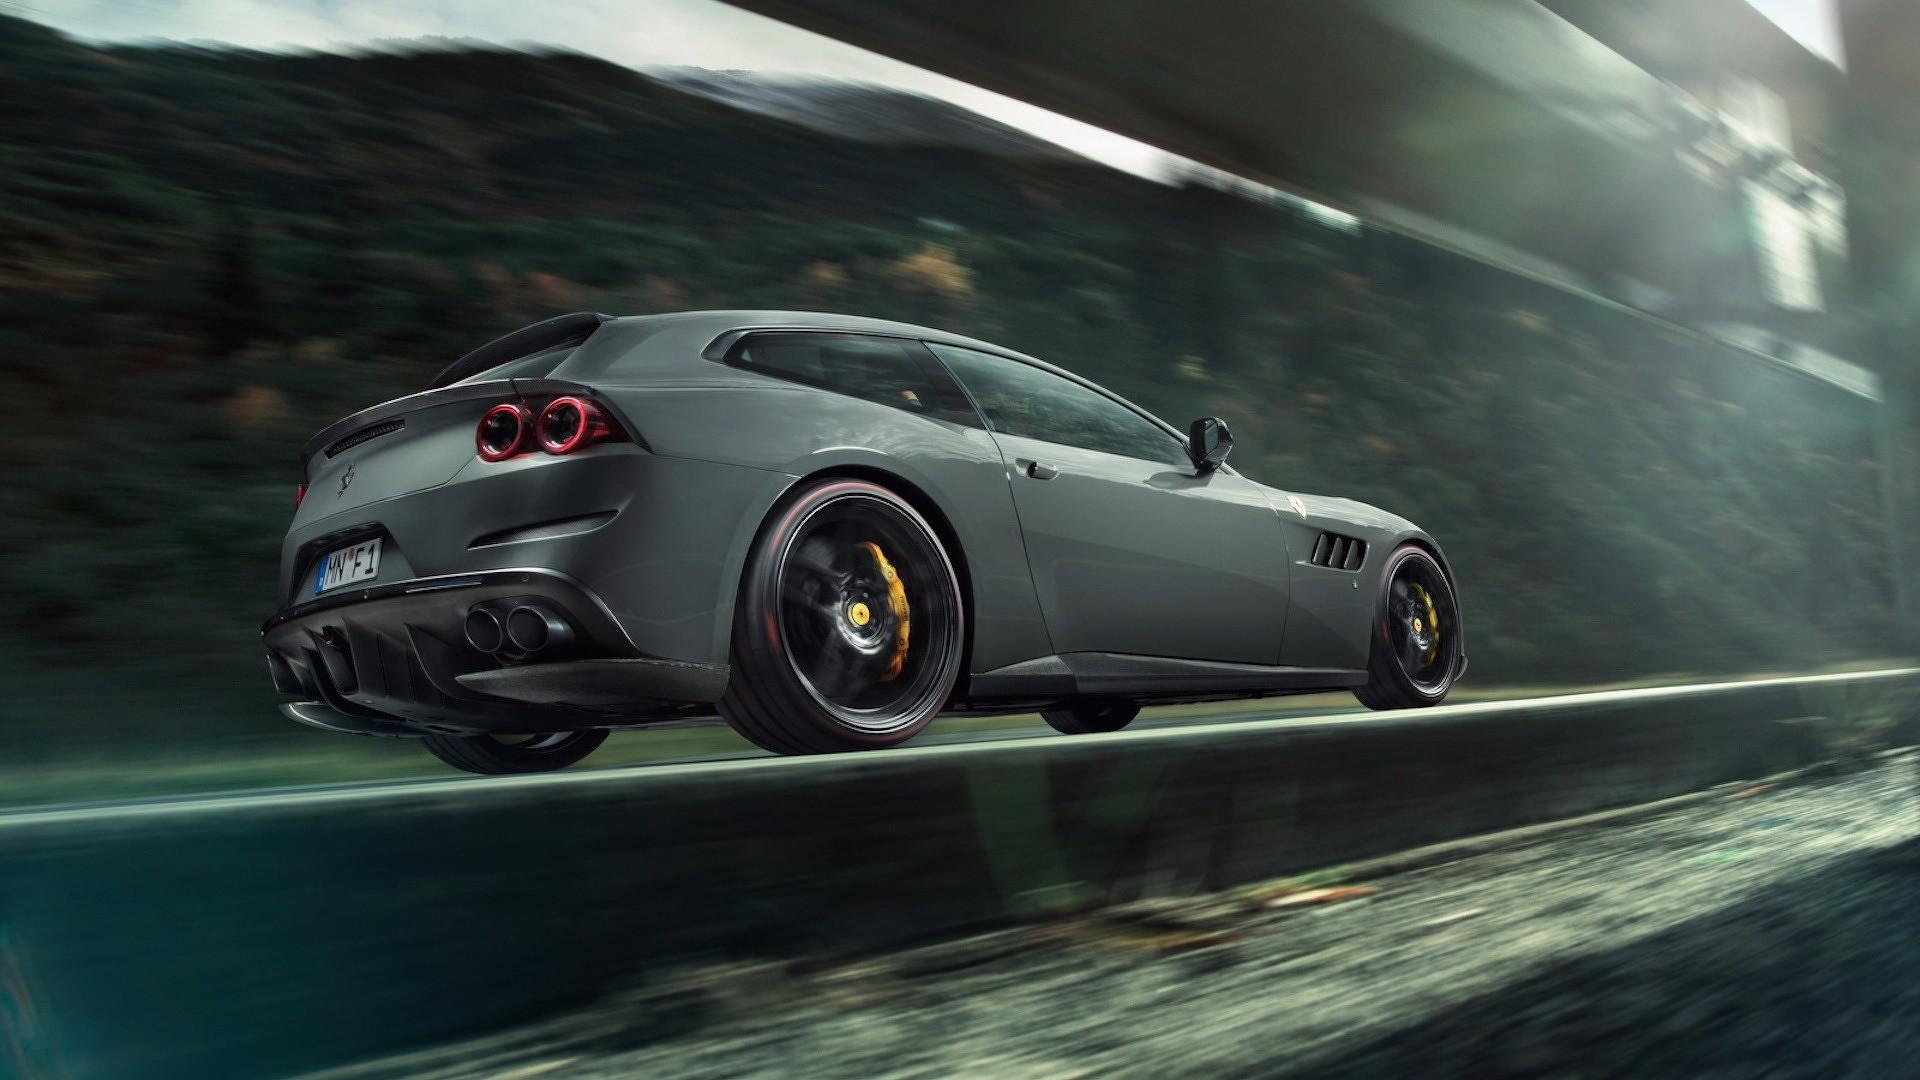 Ferrari GTC4Lusso by Novitec (4)